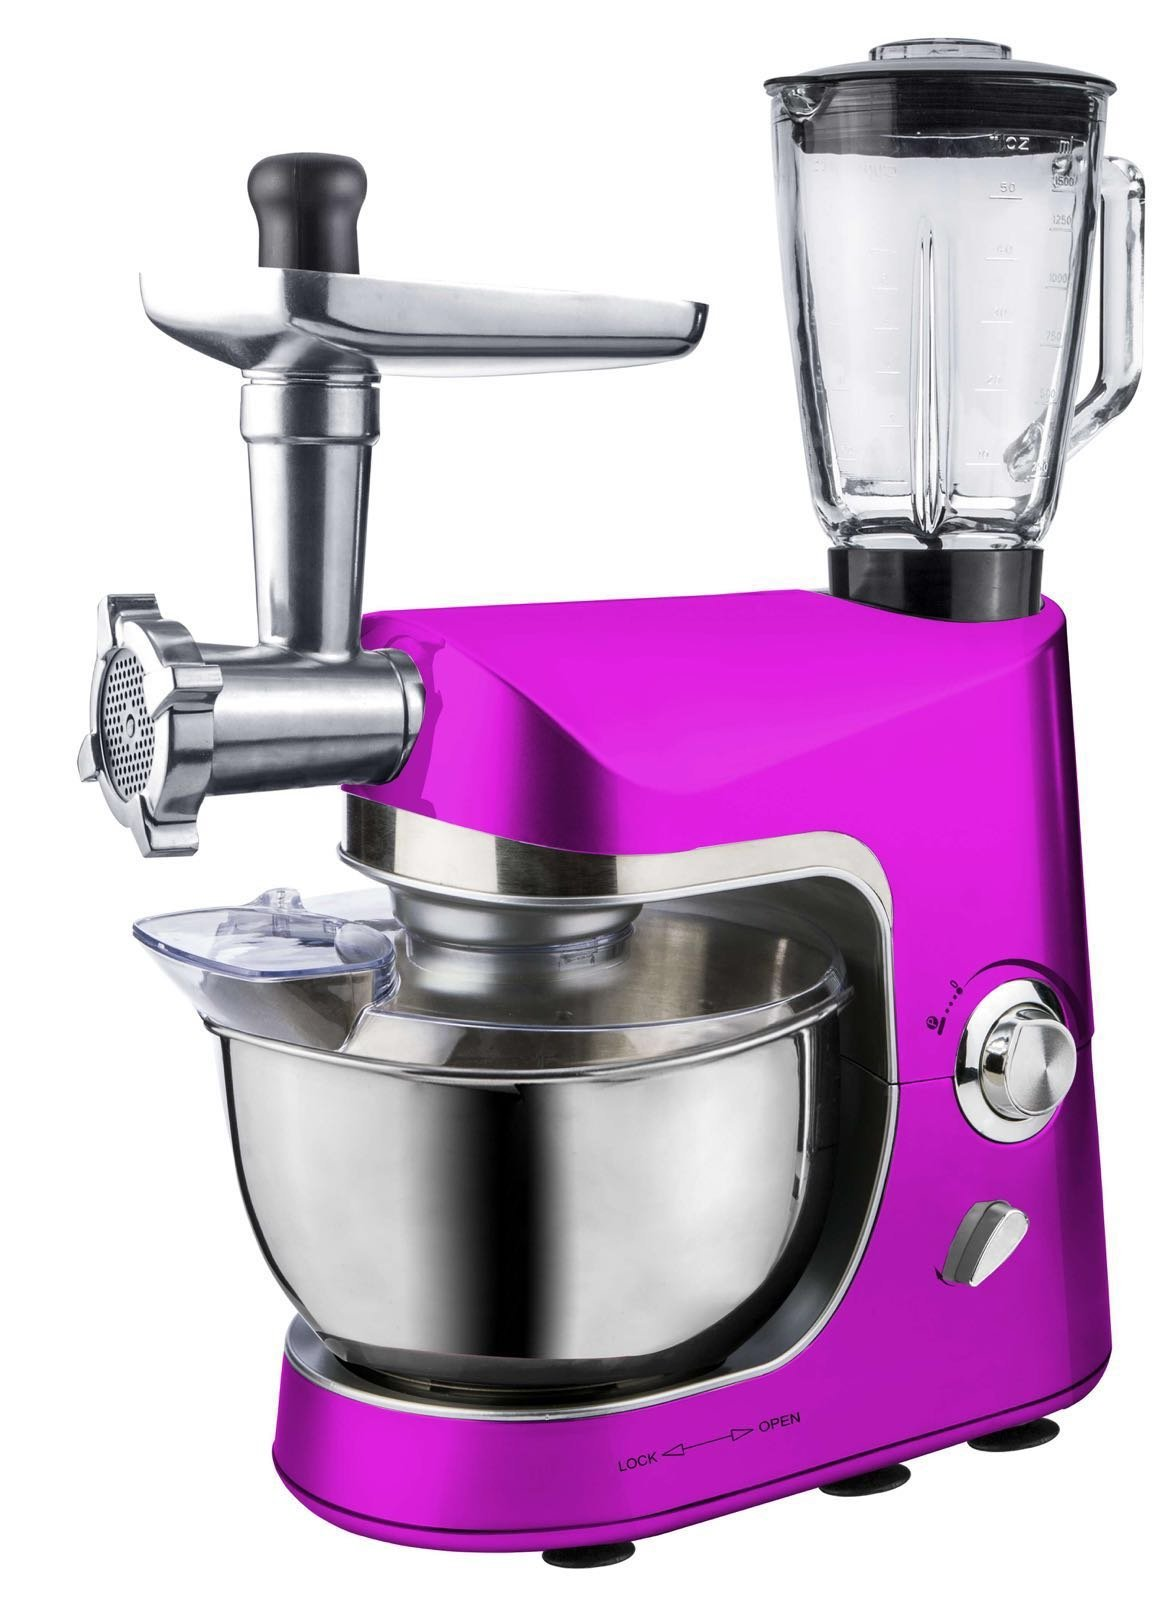 JOLTA MLINE Mix Master luxuriöse Robot de cocina: Amazon.es: Hogar